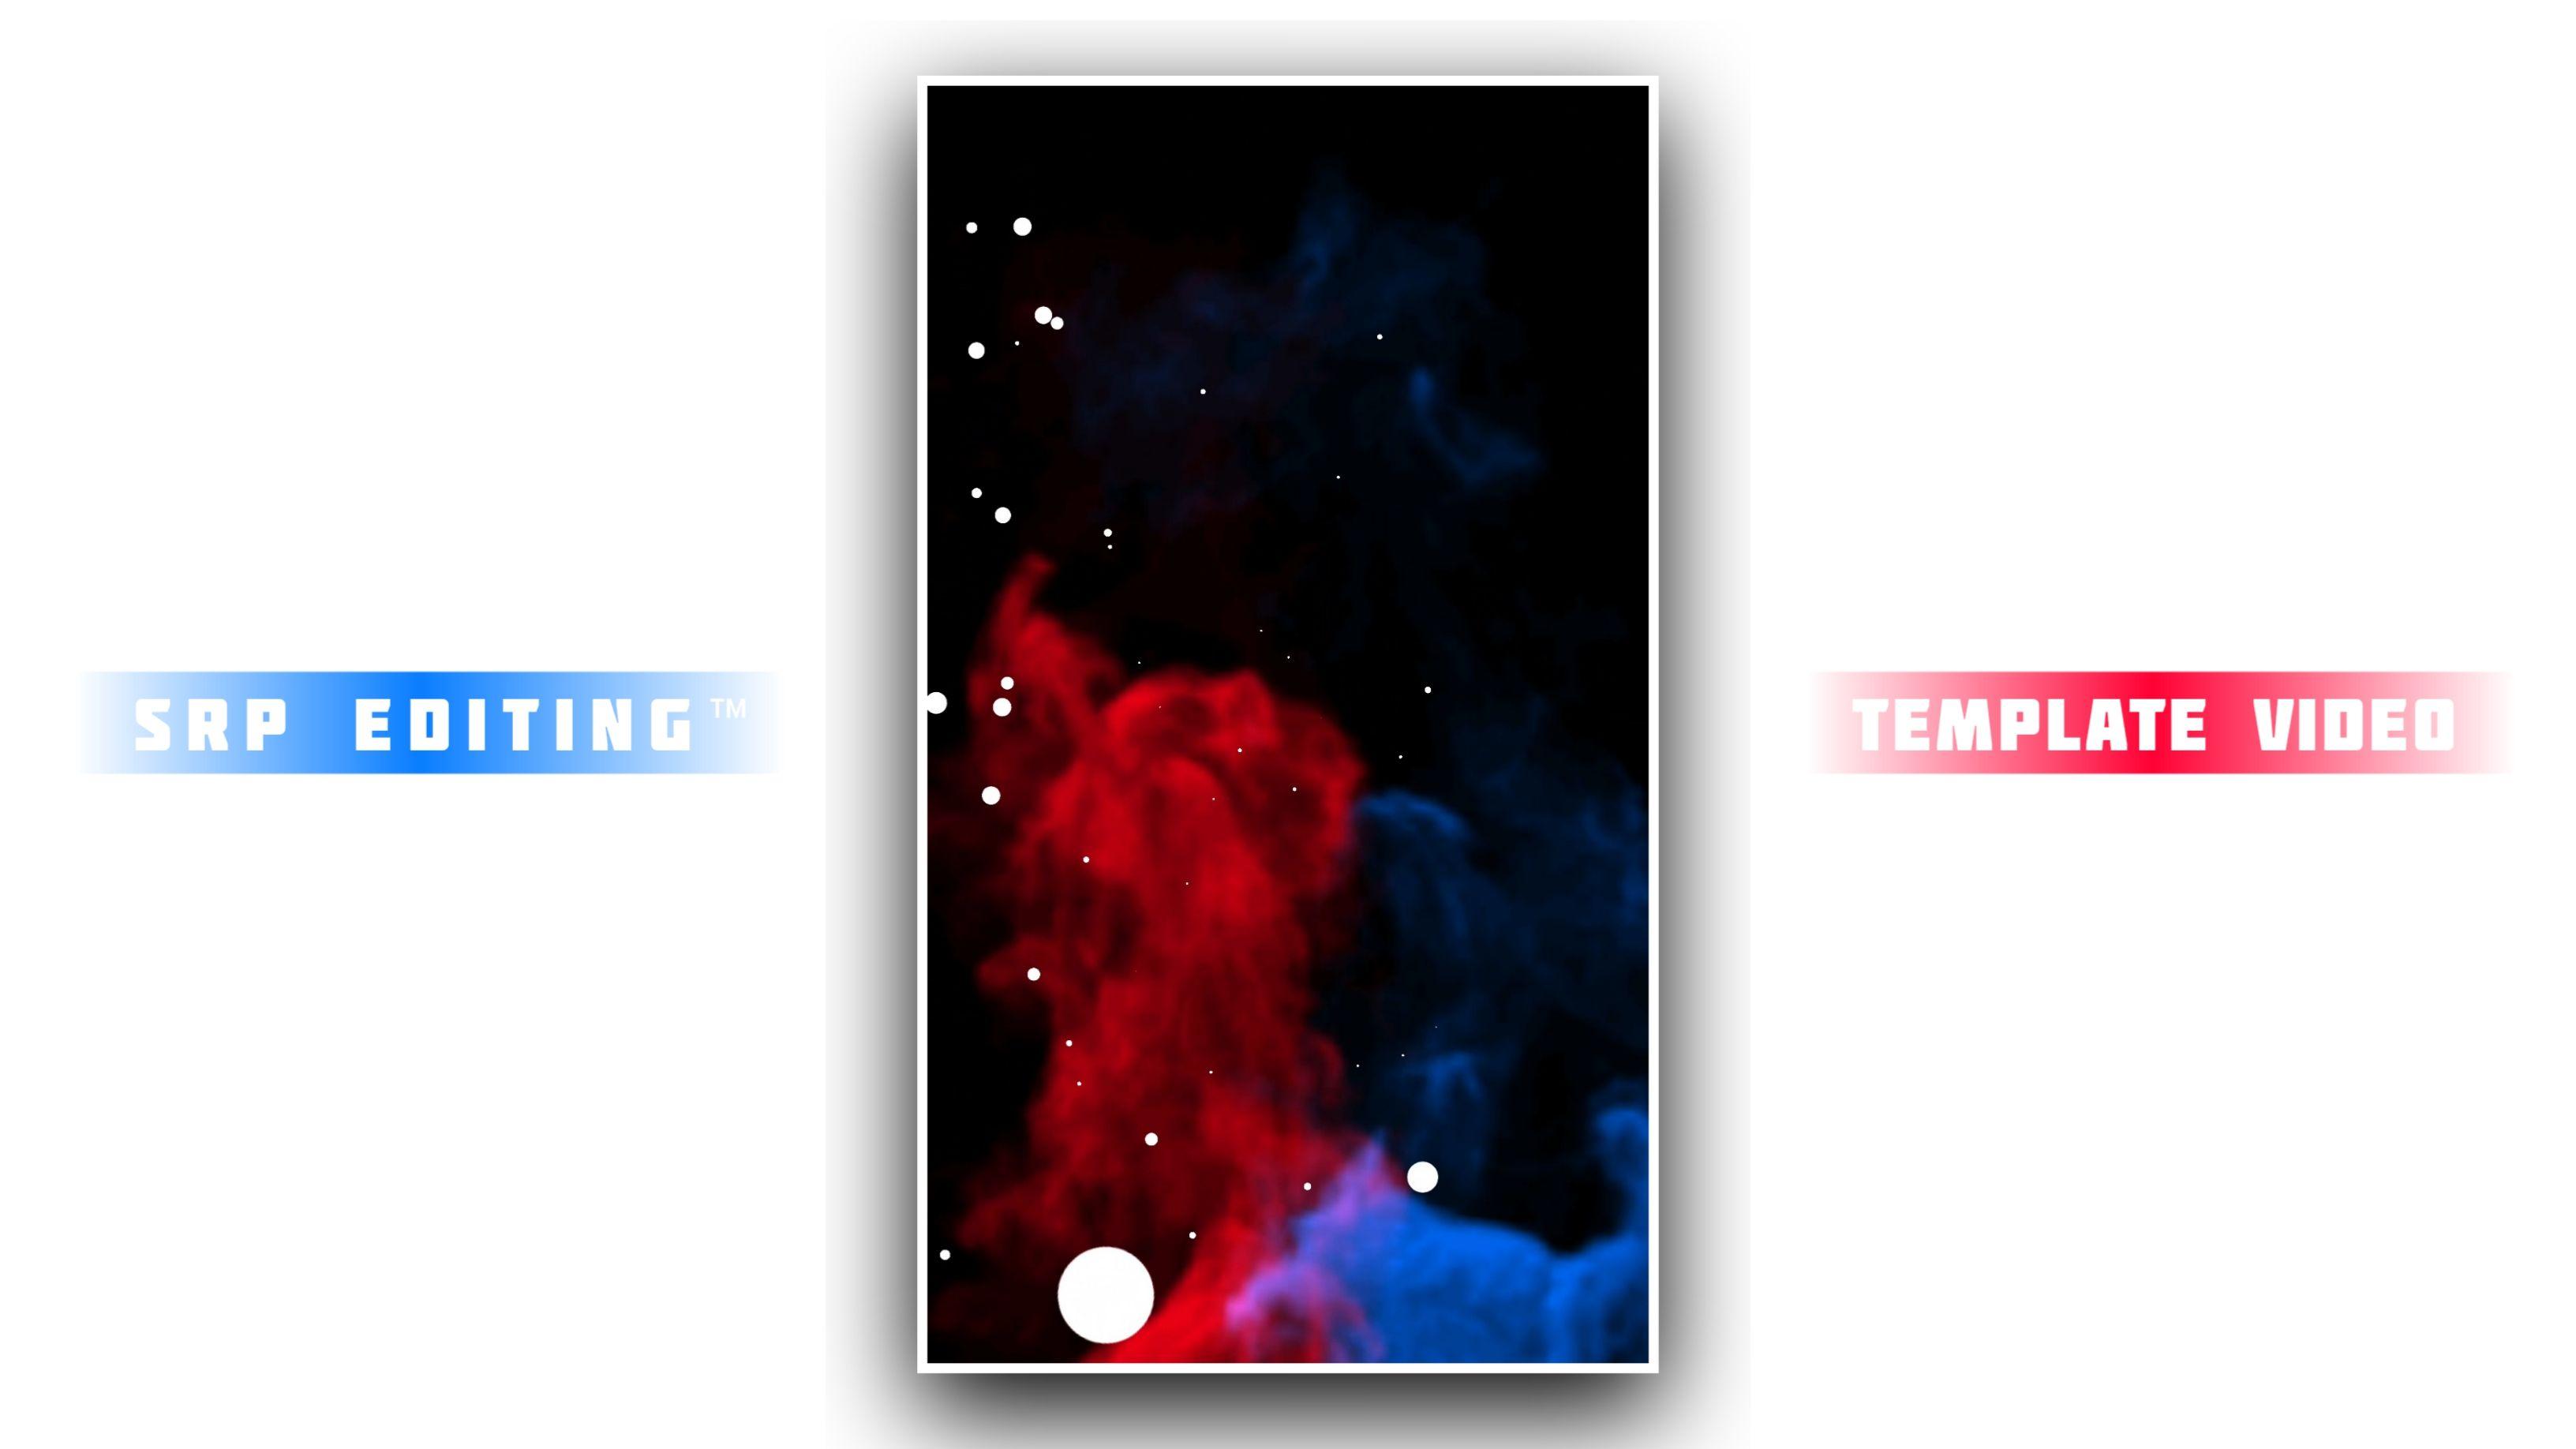 Smoke RBG Effect Kinemaster Template Download